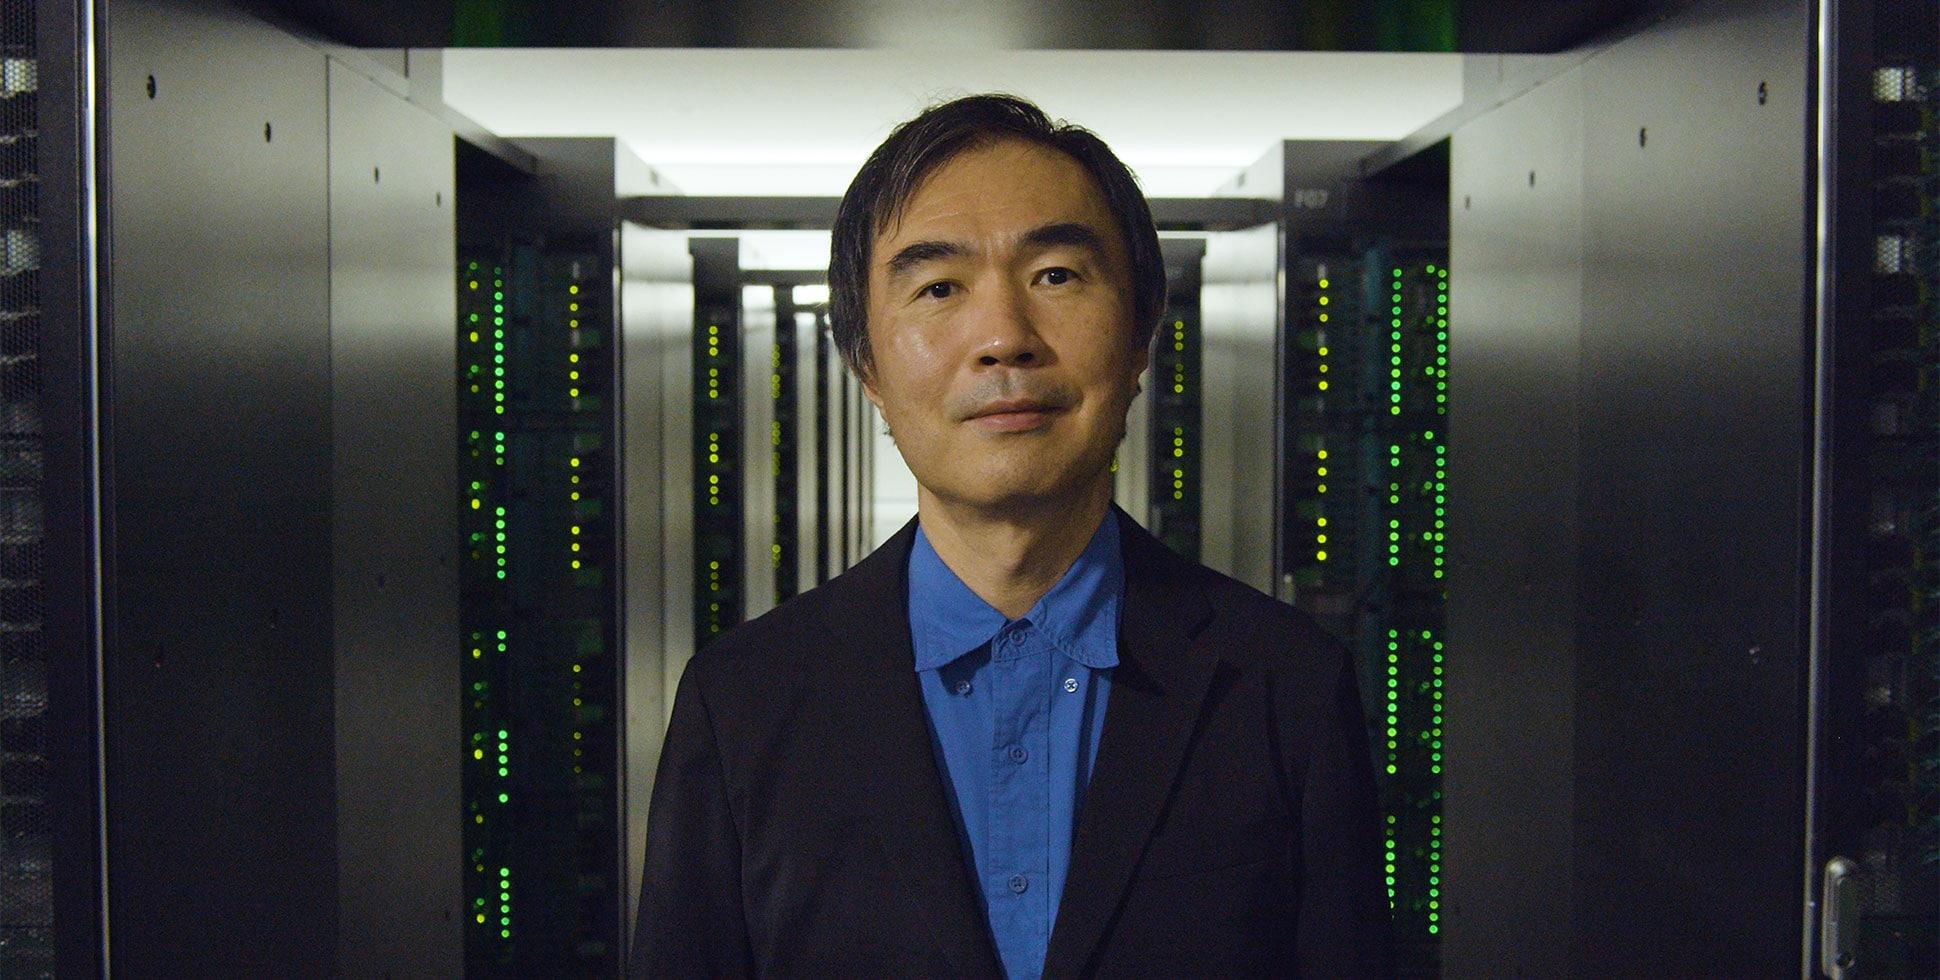 Fugaku: Building an Arm-powered Supercomputer